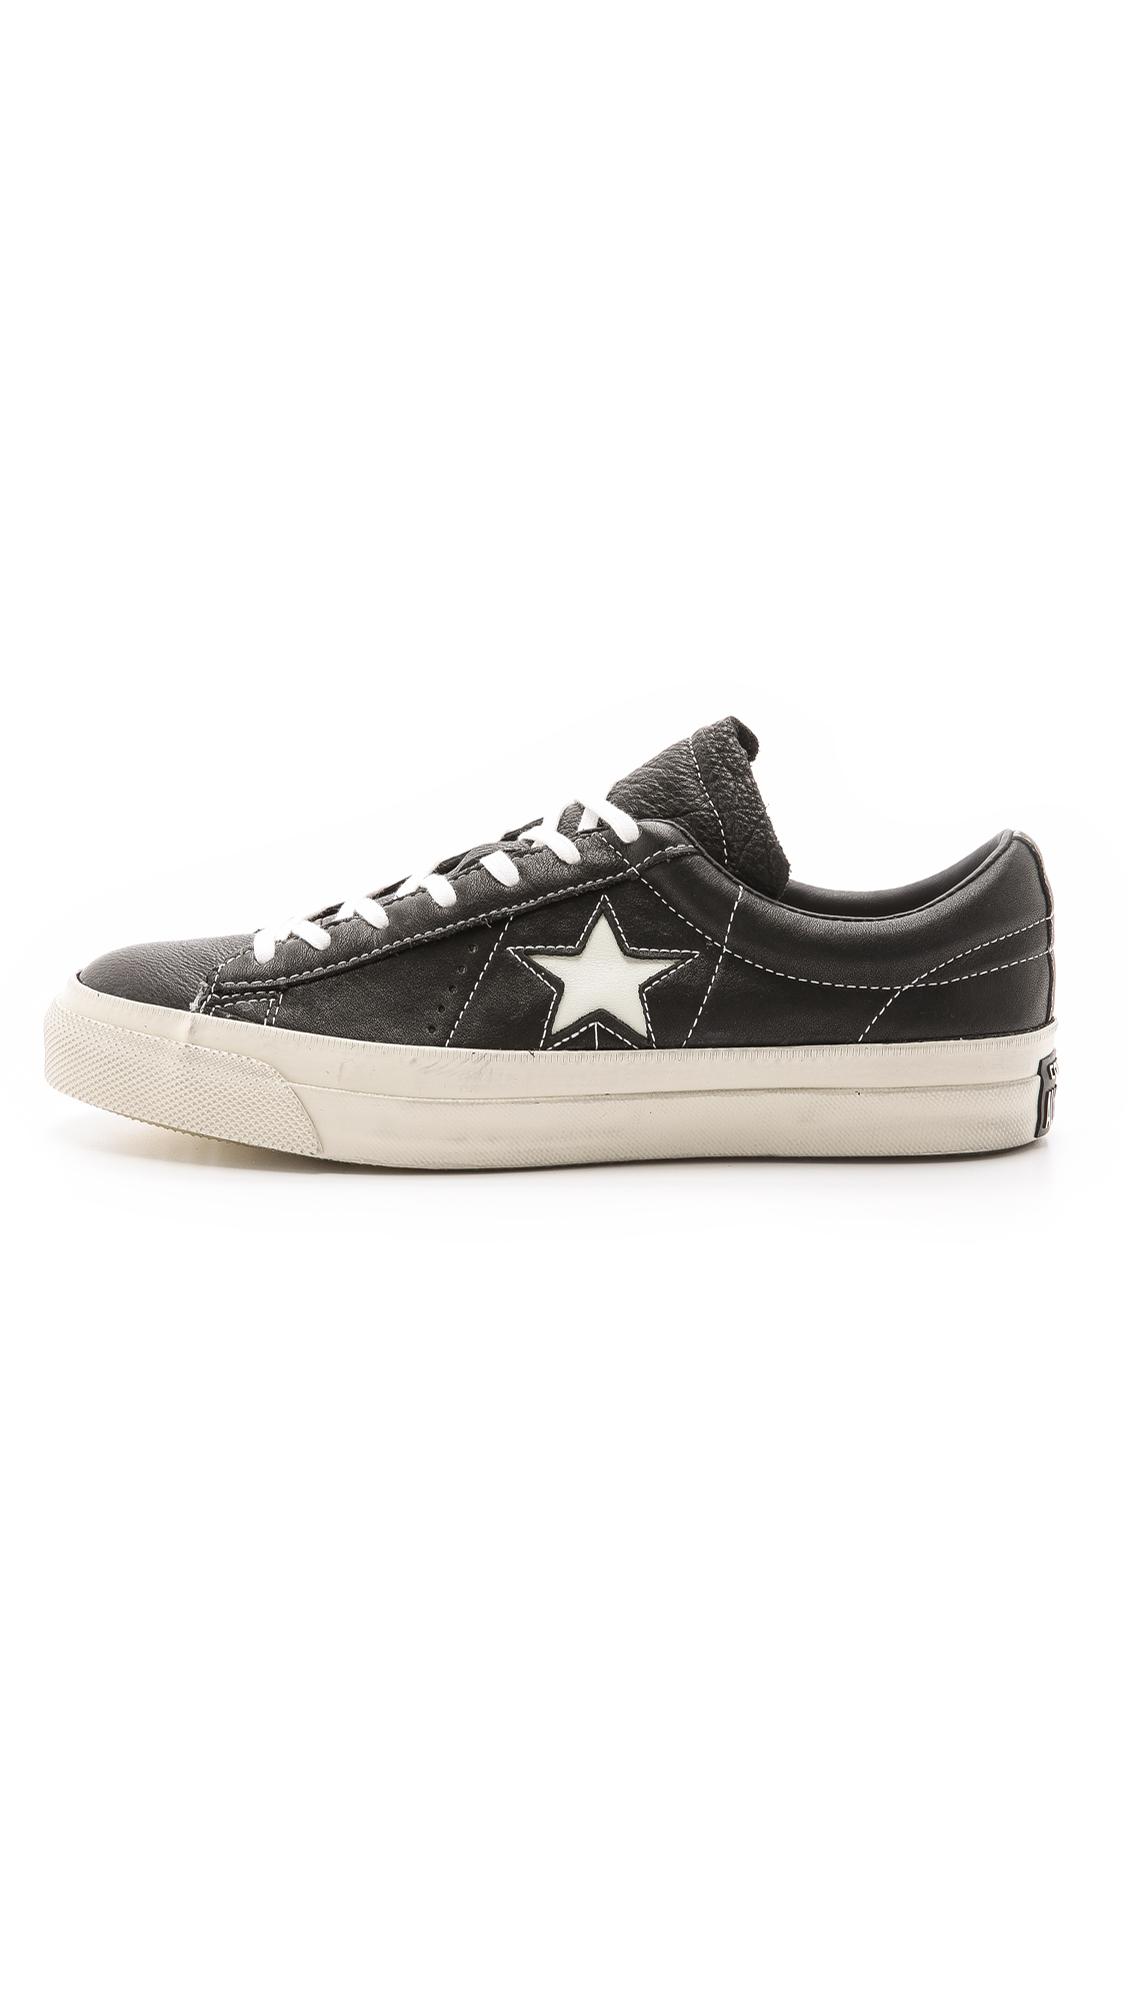 Lyst - Converse John Varvatos One Star Sneakers in Black for Men 1eab44009